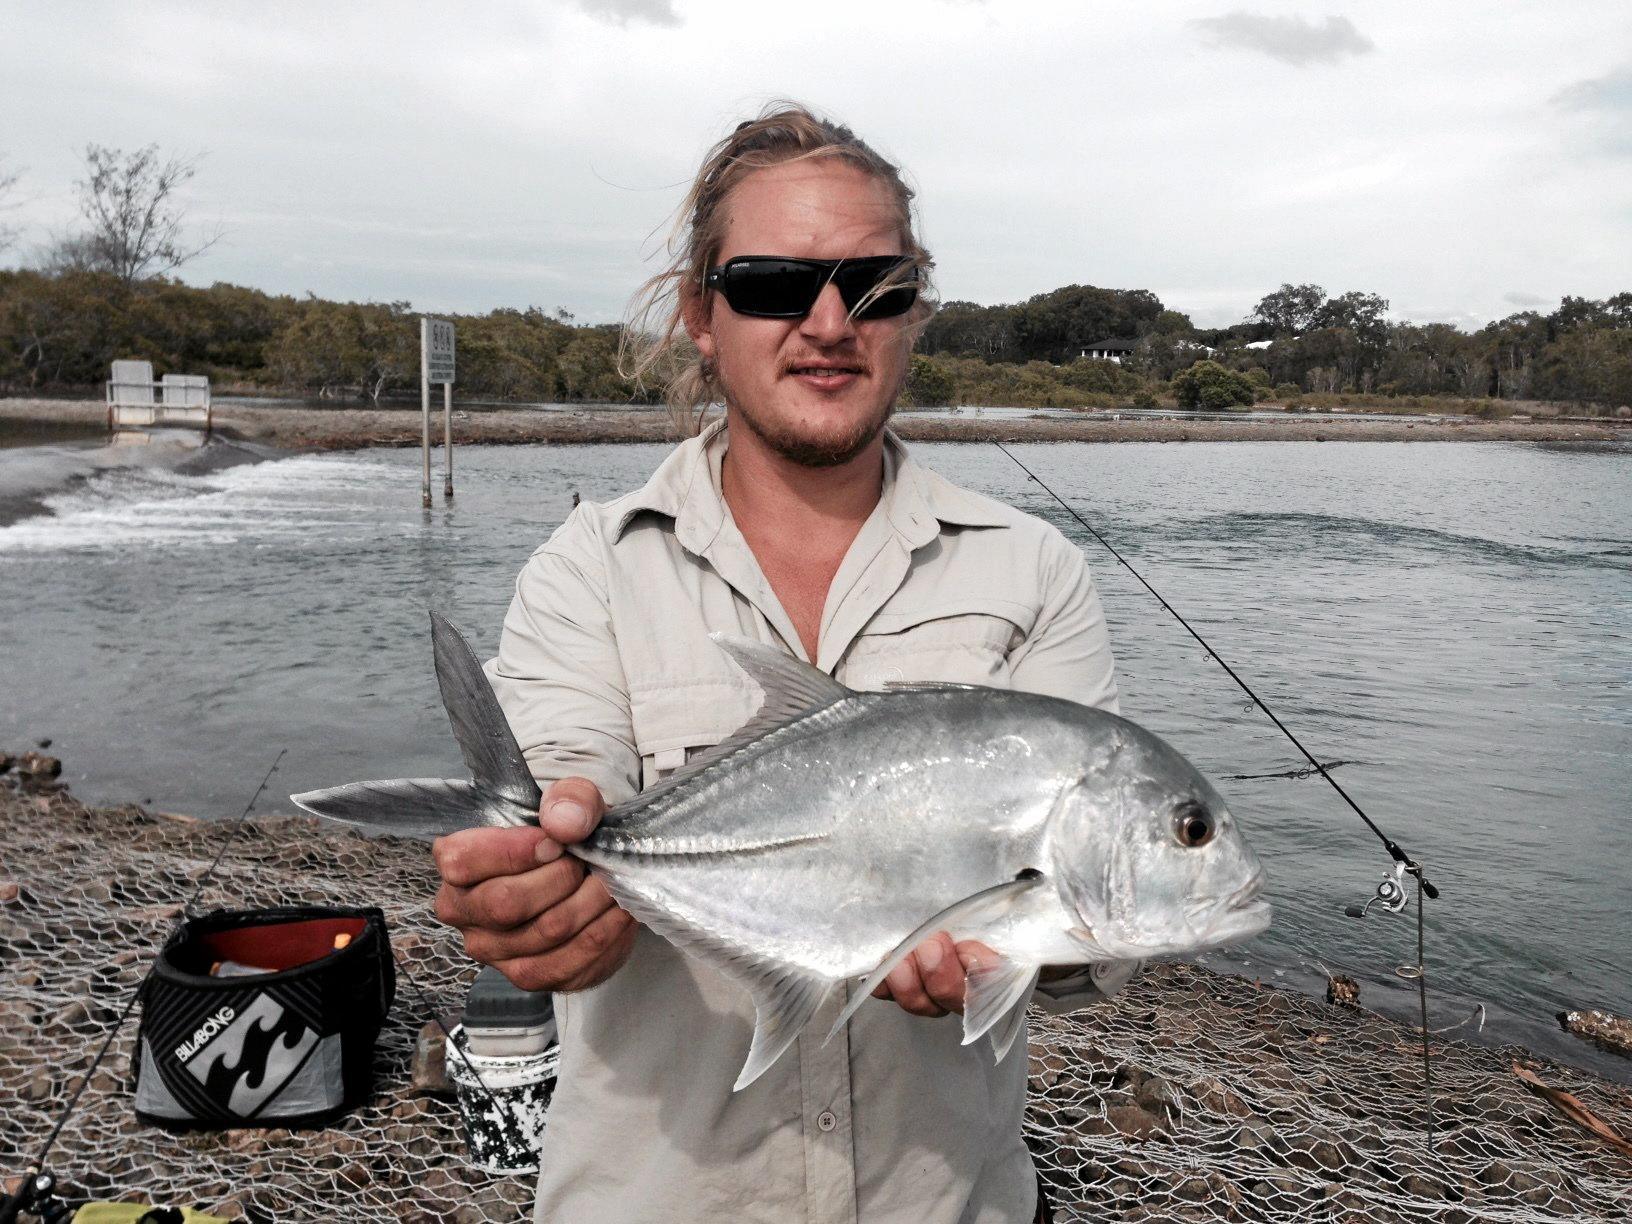 Hook a big one in landlocked areas | Sunshine Coast Daily